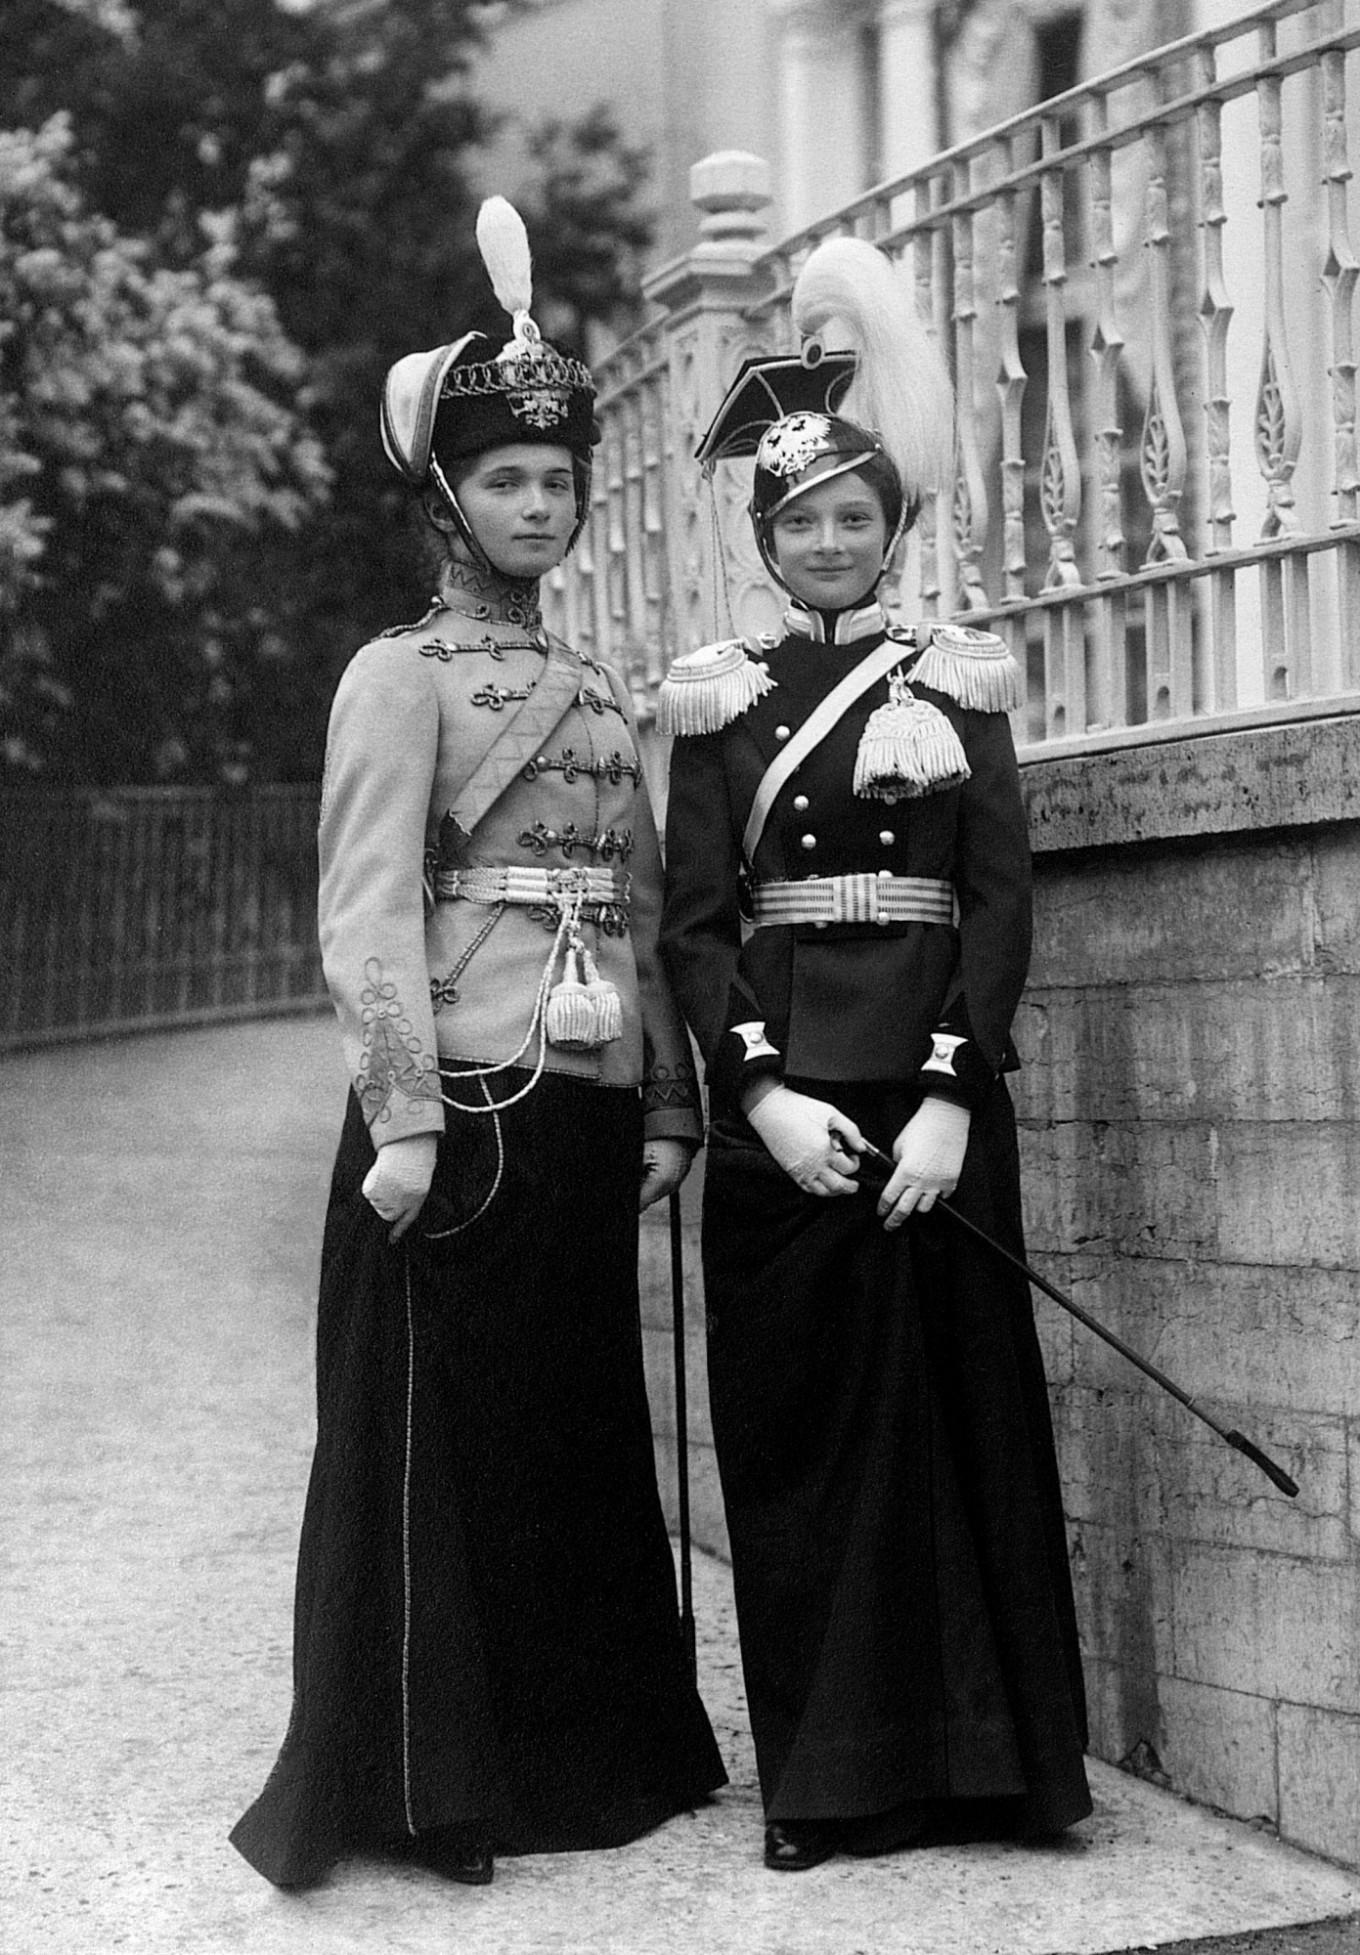 Grand Duchess Olga Nikolaevna (left) in the uniform of the Yelisavetgrad Hussars romanovempire.org